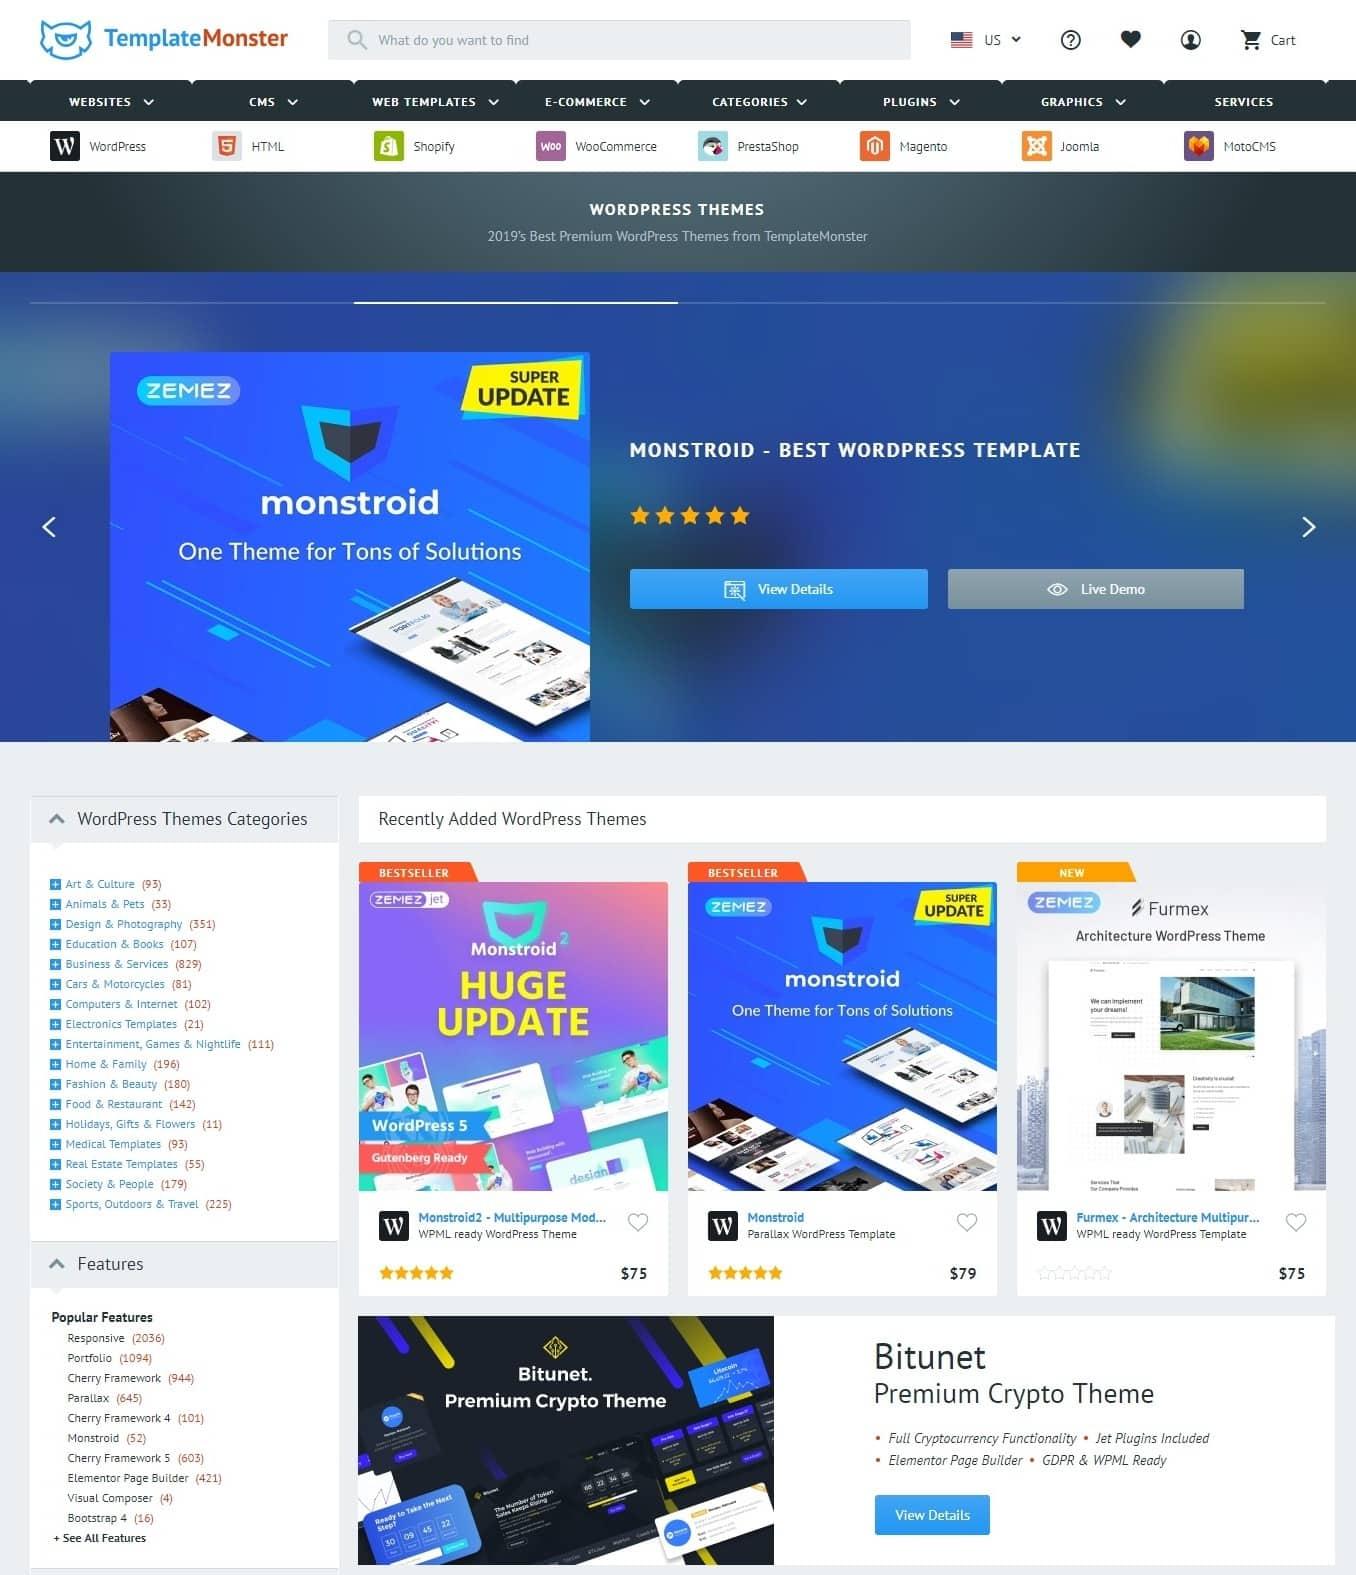 5 Top WordPress Theme Marketplaces-image2